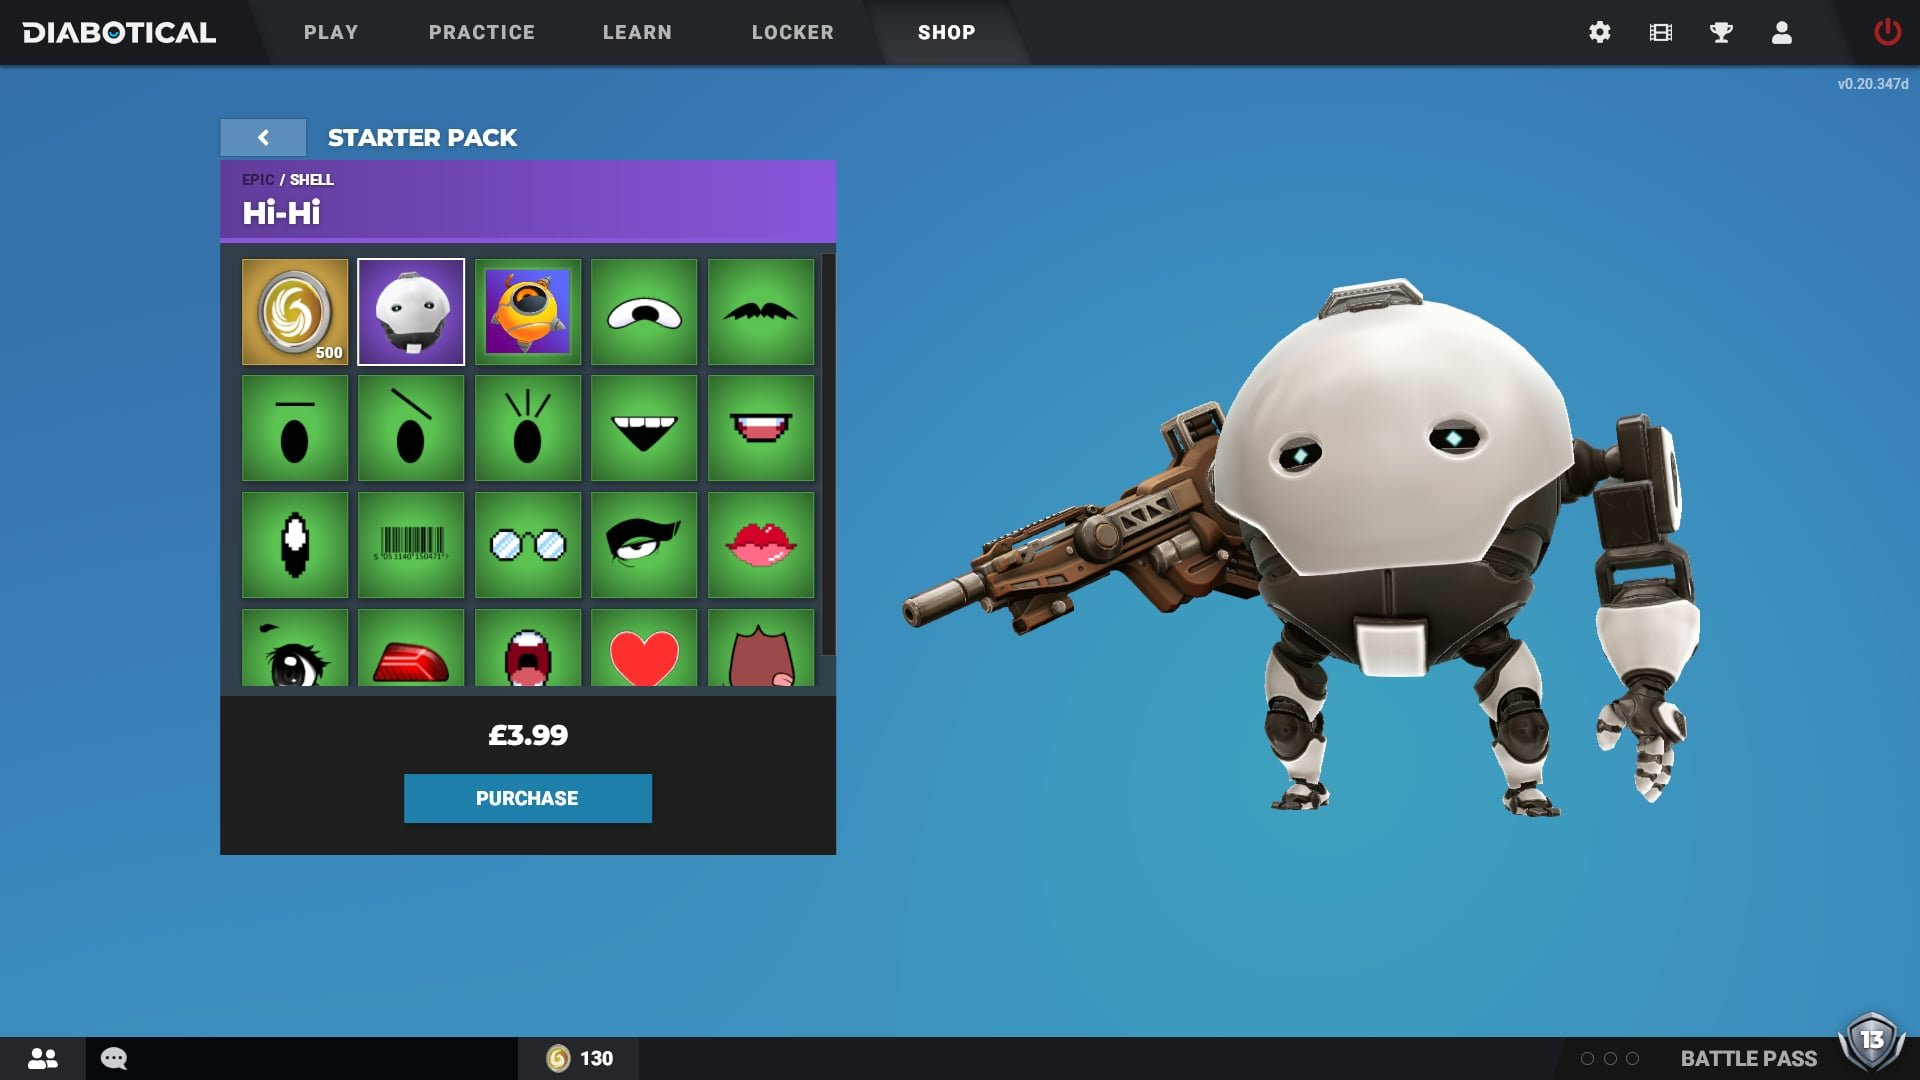 Diabotical Gameplay Shop Starter Pack